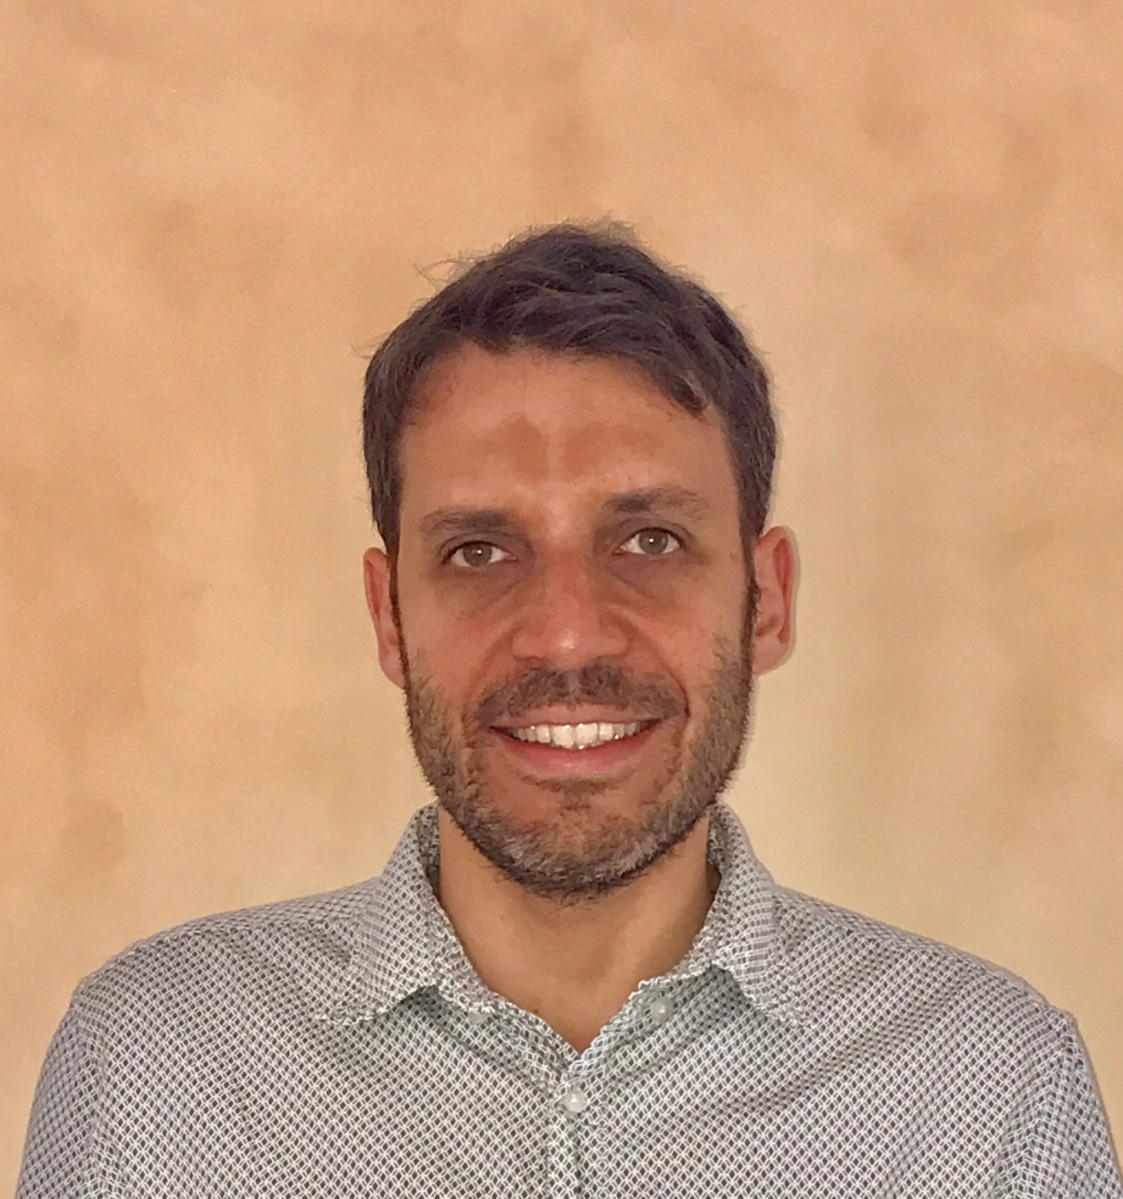 Manuel Covo